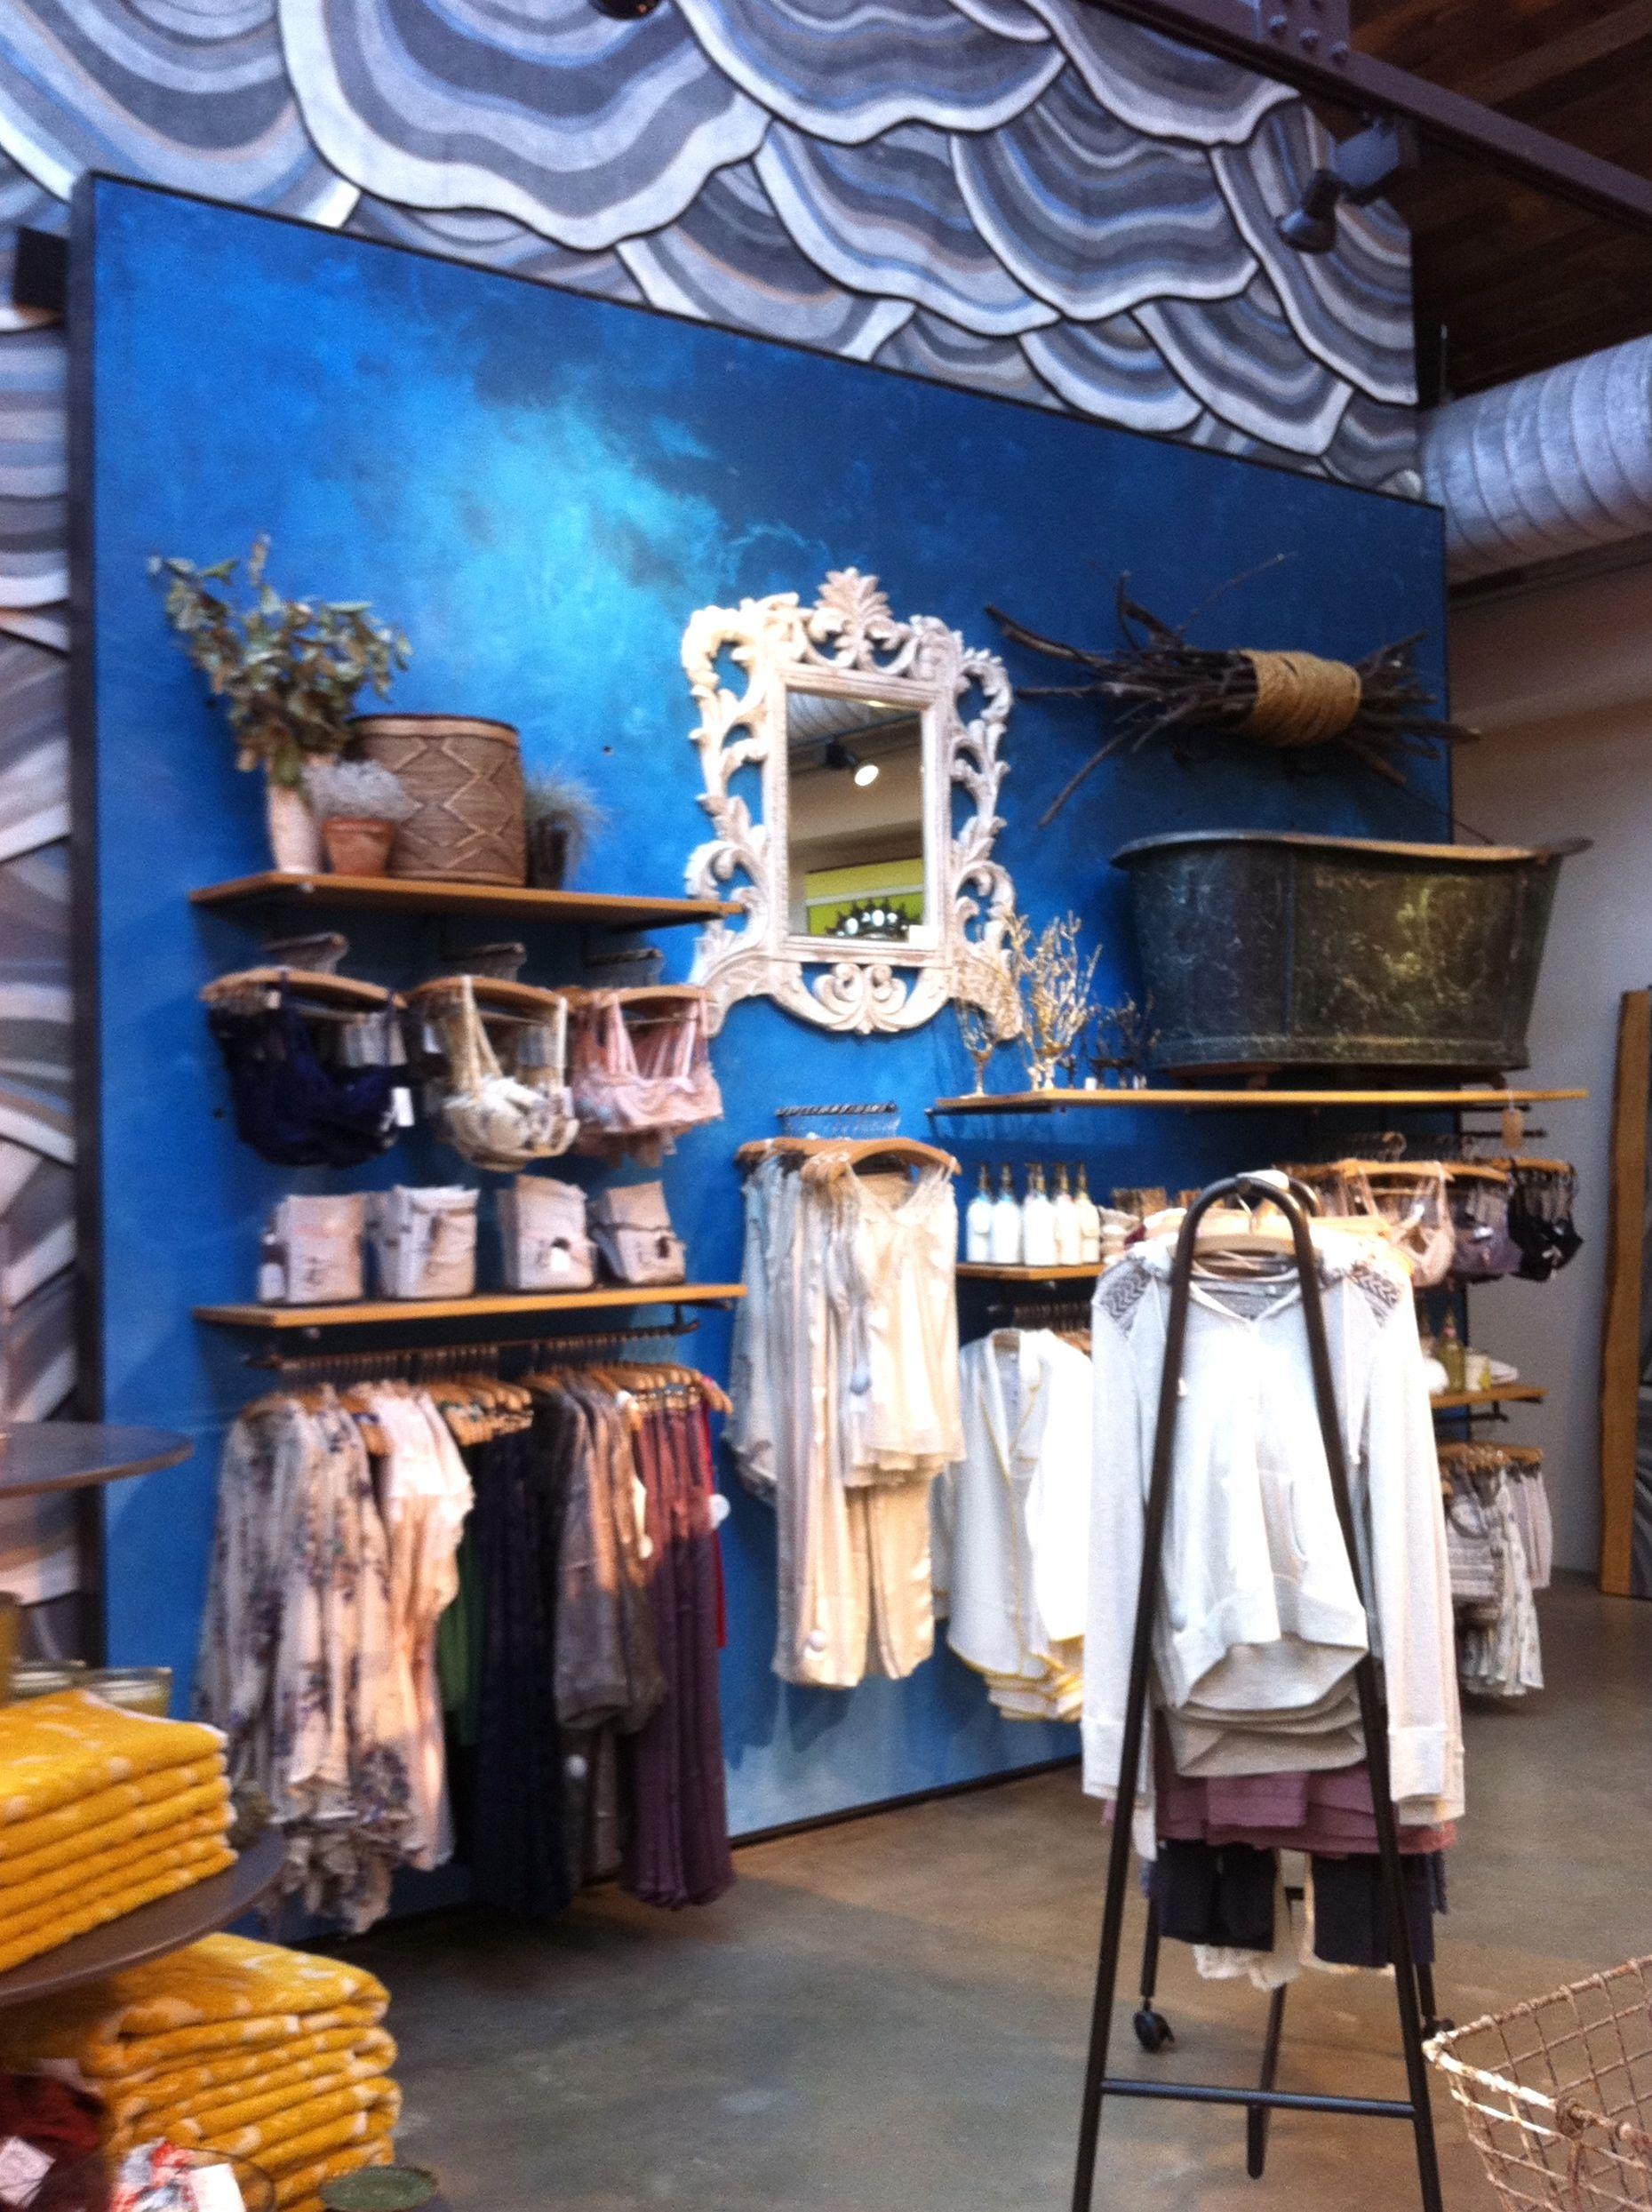 anthropologie store interior visual merchandising interiors clothing store displays store. Black Bedroom Furniture Sets. Home Design Ideas